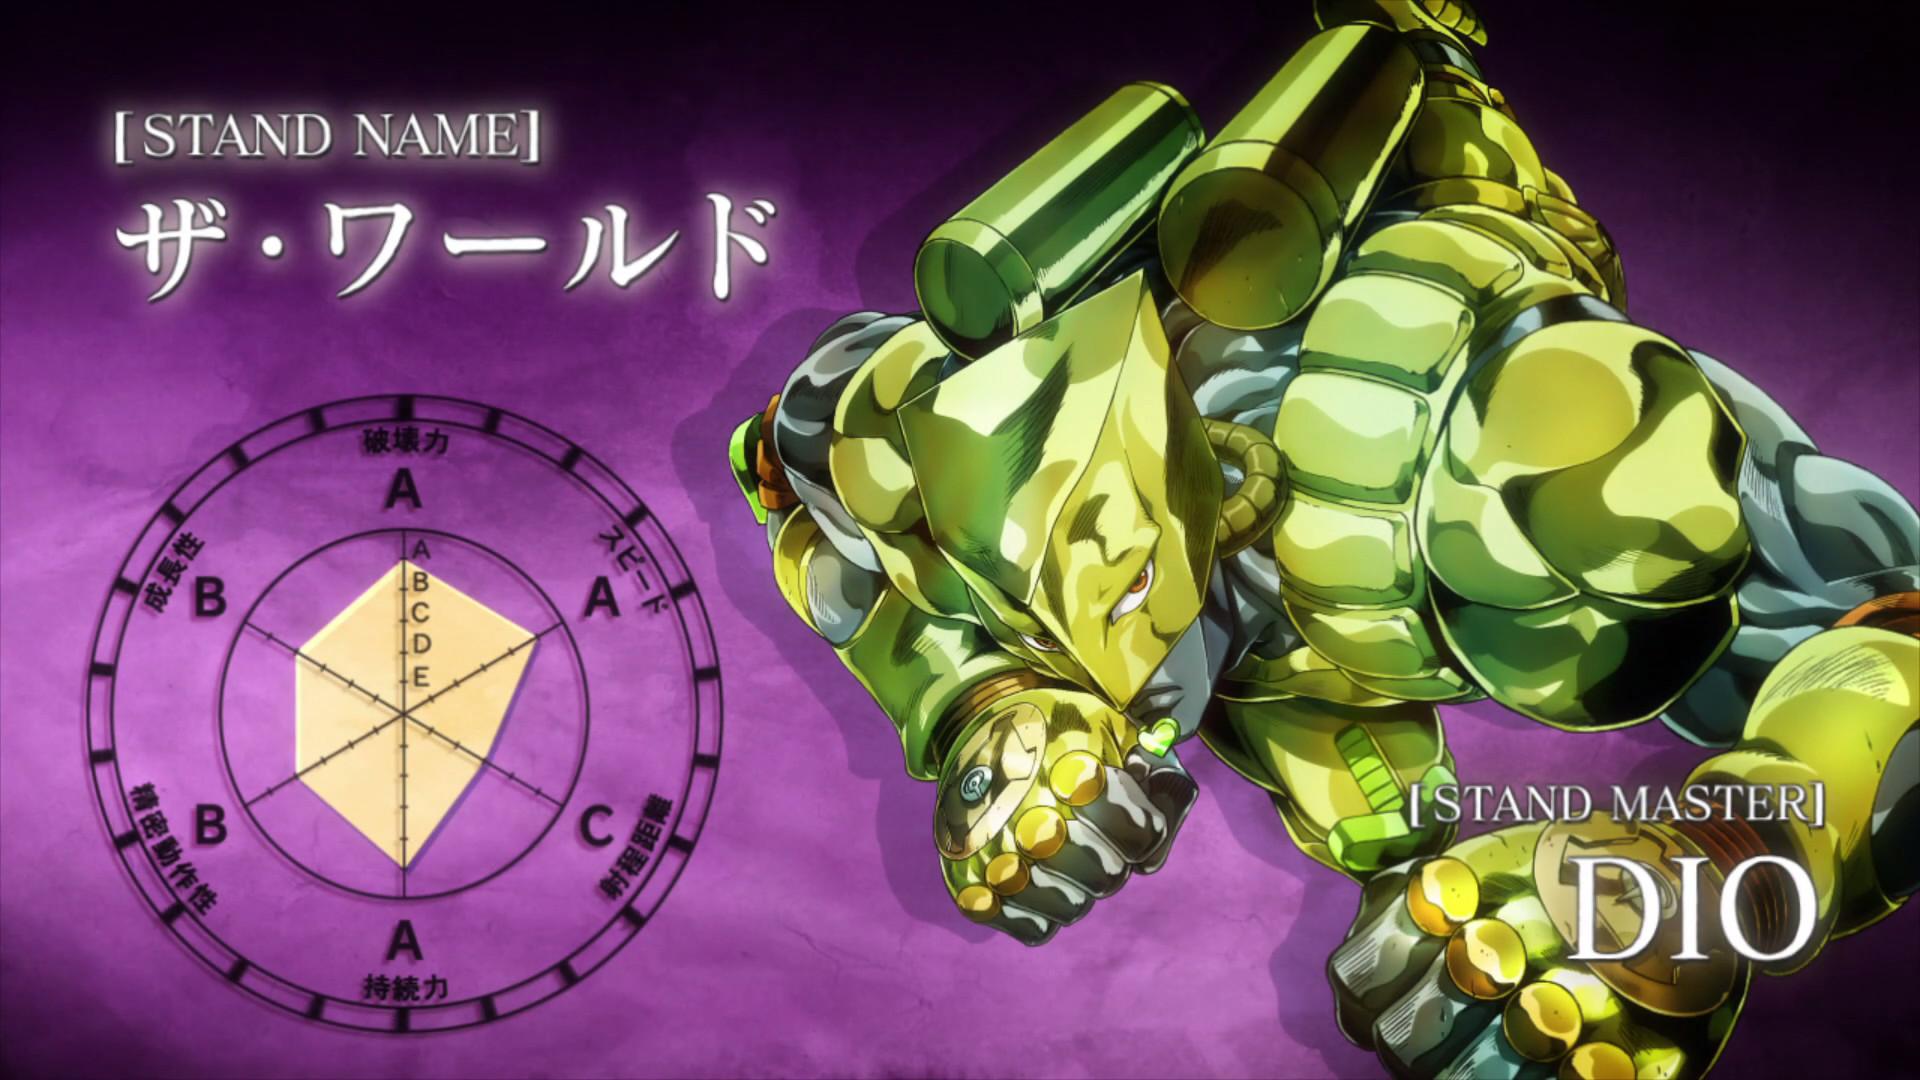 HD Wallpaper   Background ID:659506. Anime Jojo's Bizarre  Adventure